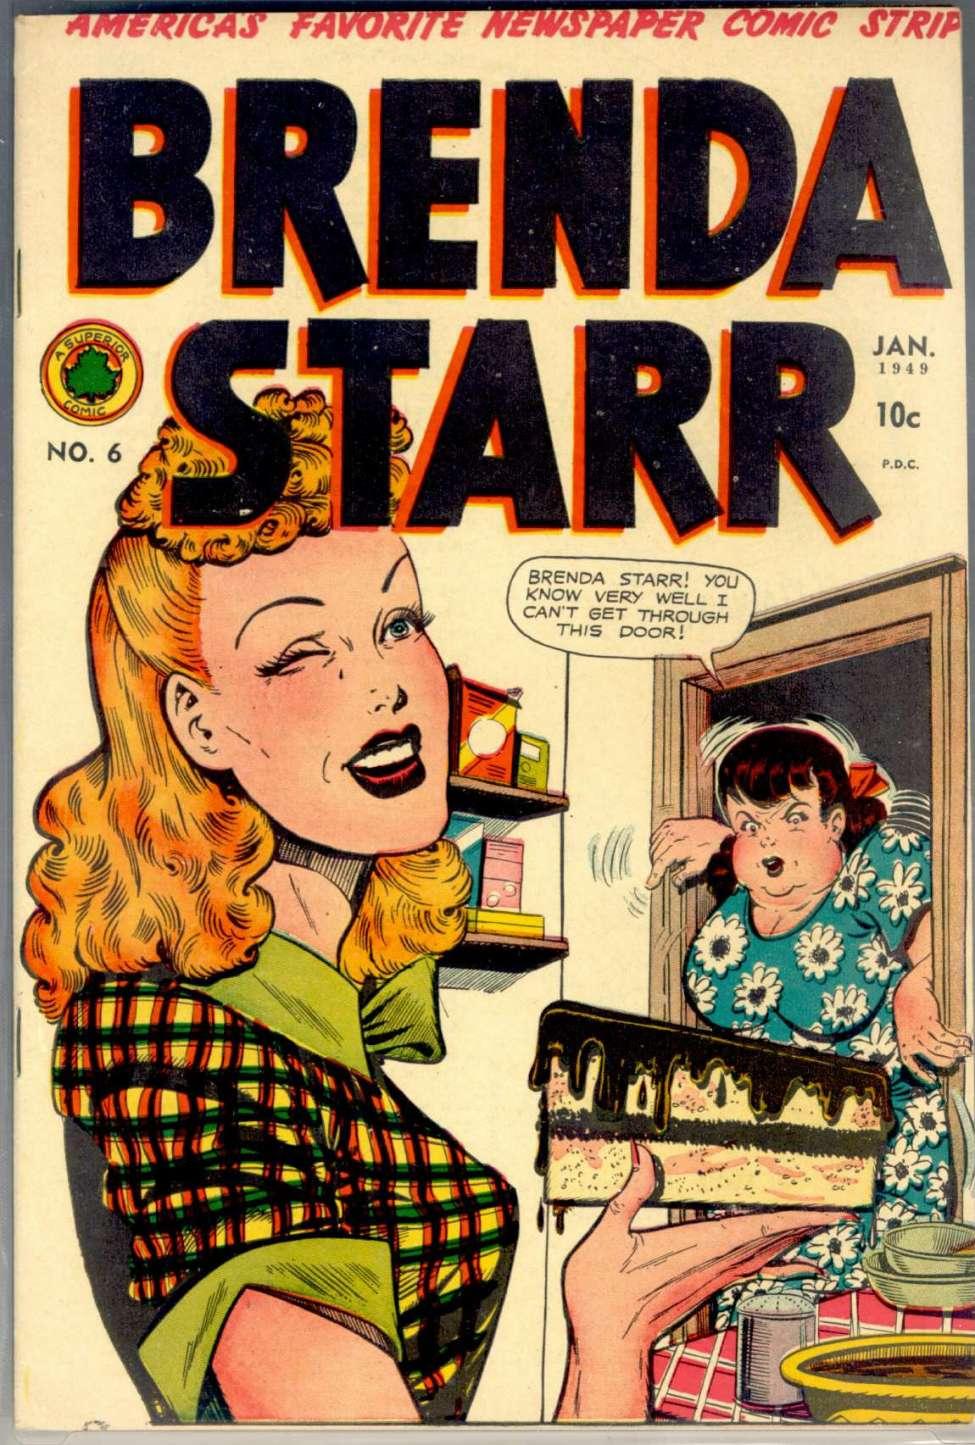 Brenda starr july 26 comic strip